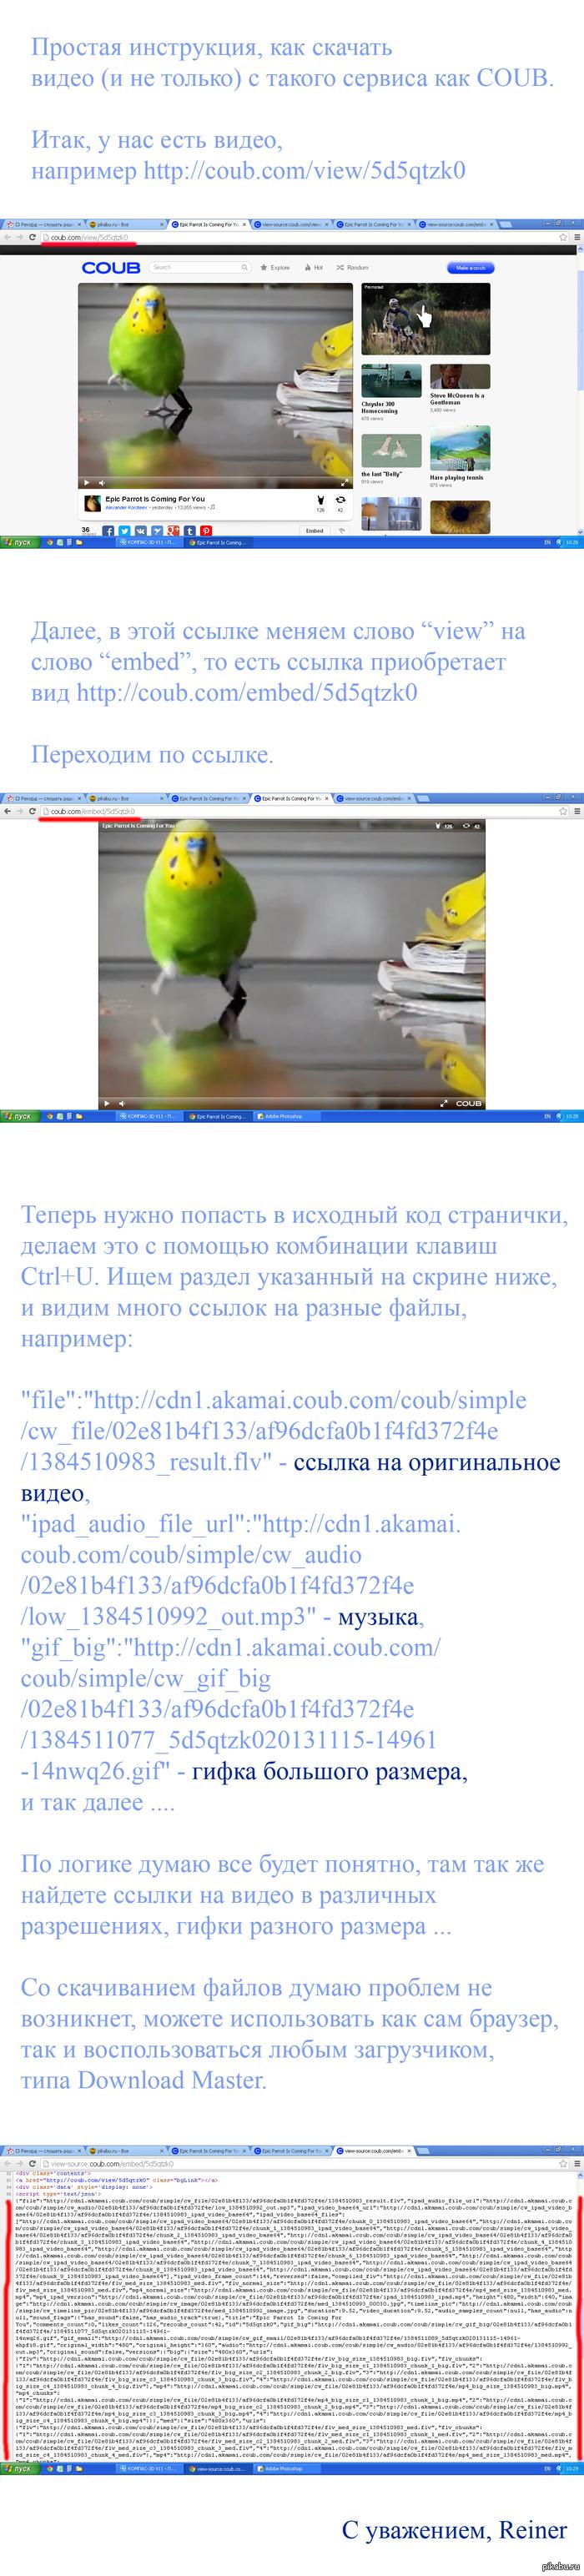 https://cs.pikabu.ru/post_img/2013/11/18/5/1384751287_642909219.jpg